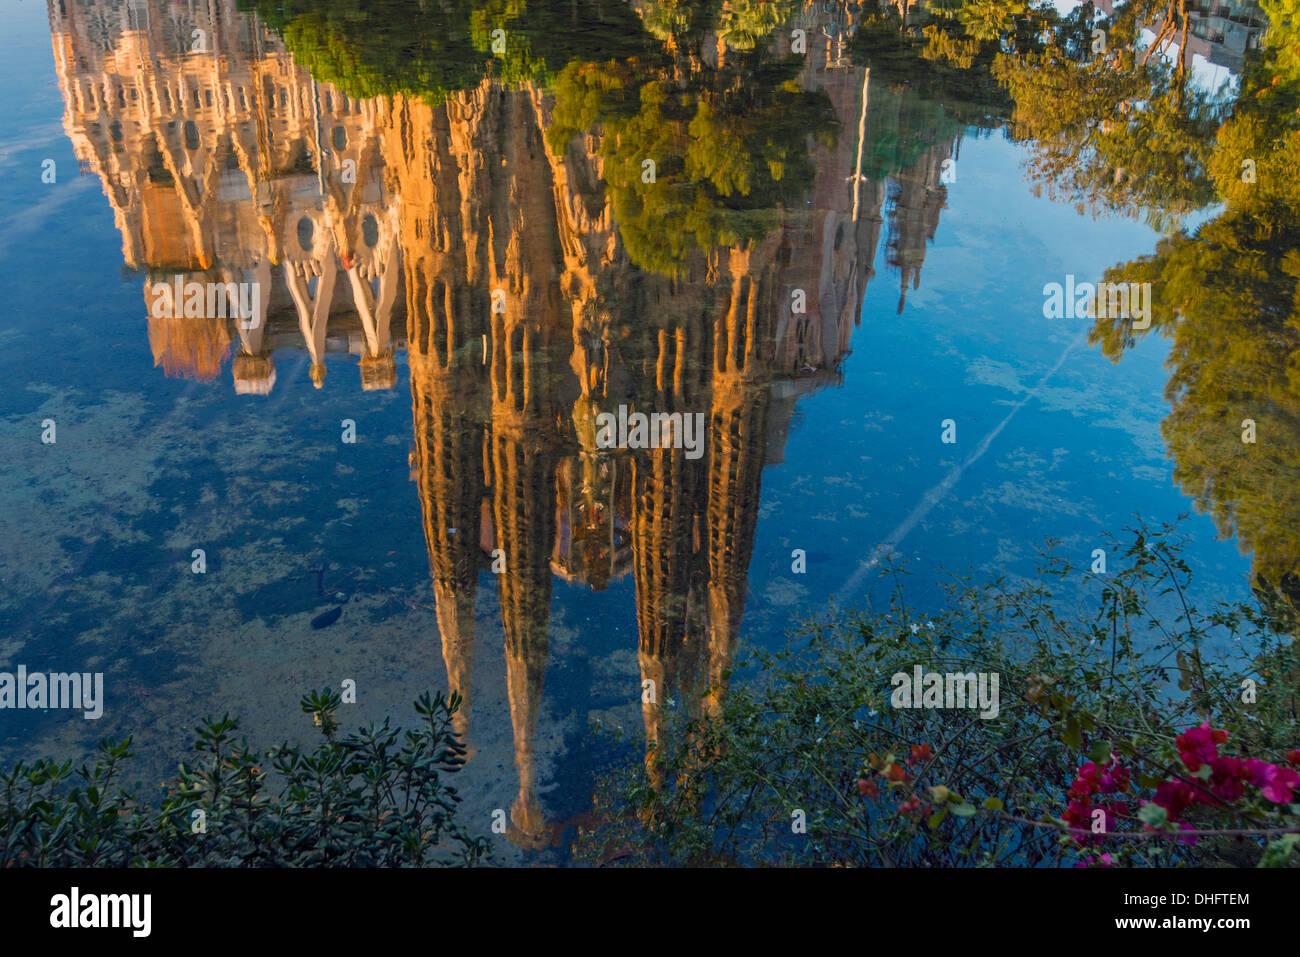 Sagrada Familia church reflected into a pond, Barcelona, Catalonia, Spain - Stock Image